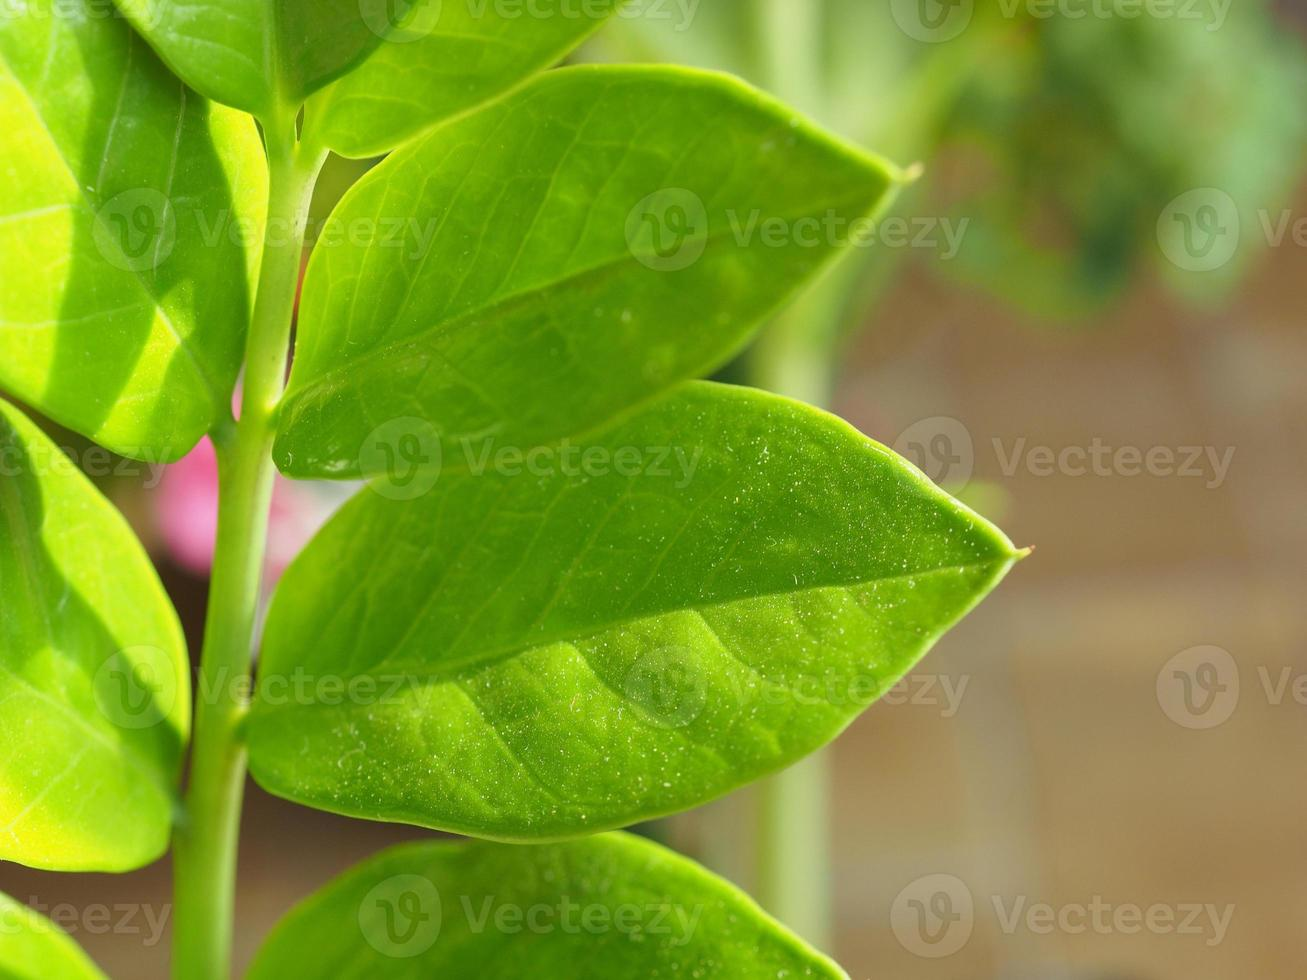 planta zamia também conhecida como folha zamia furfuracea foto